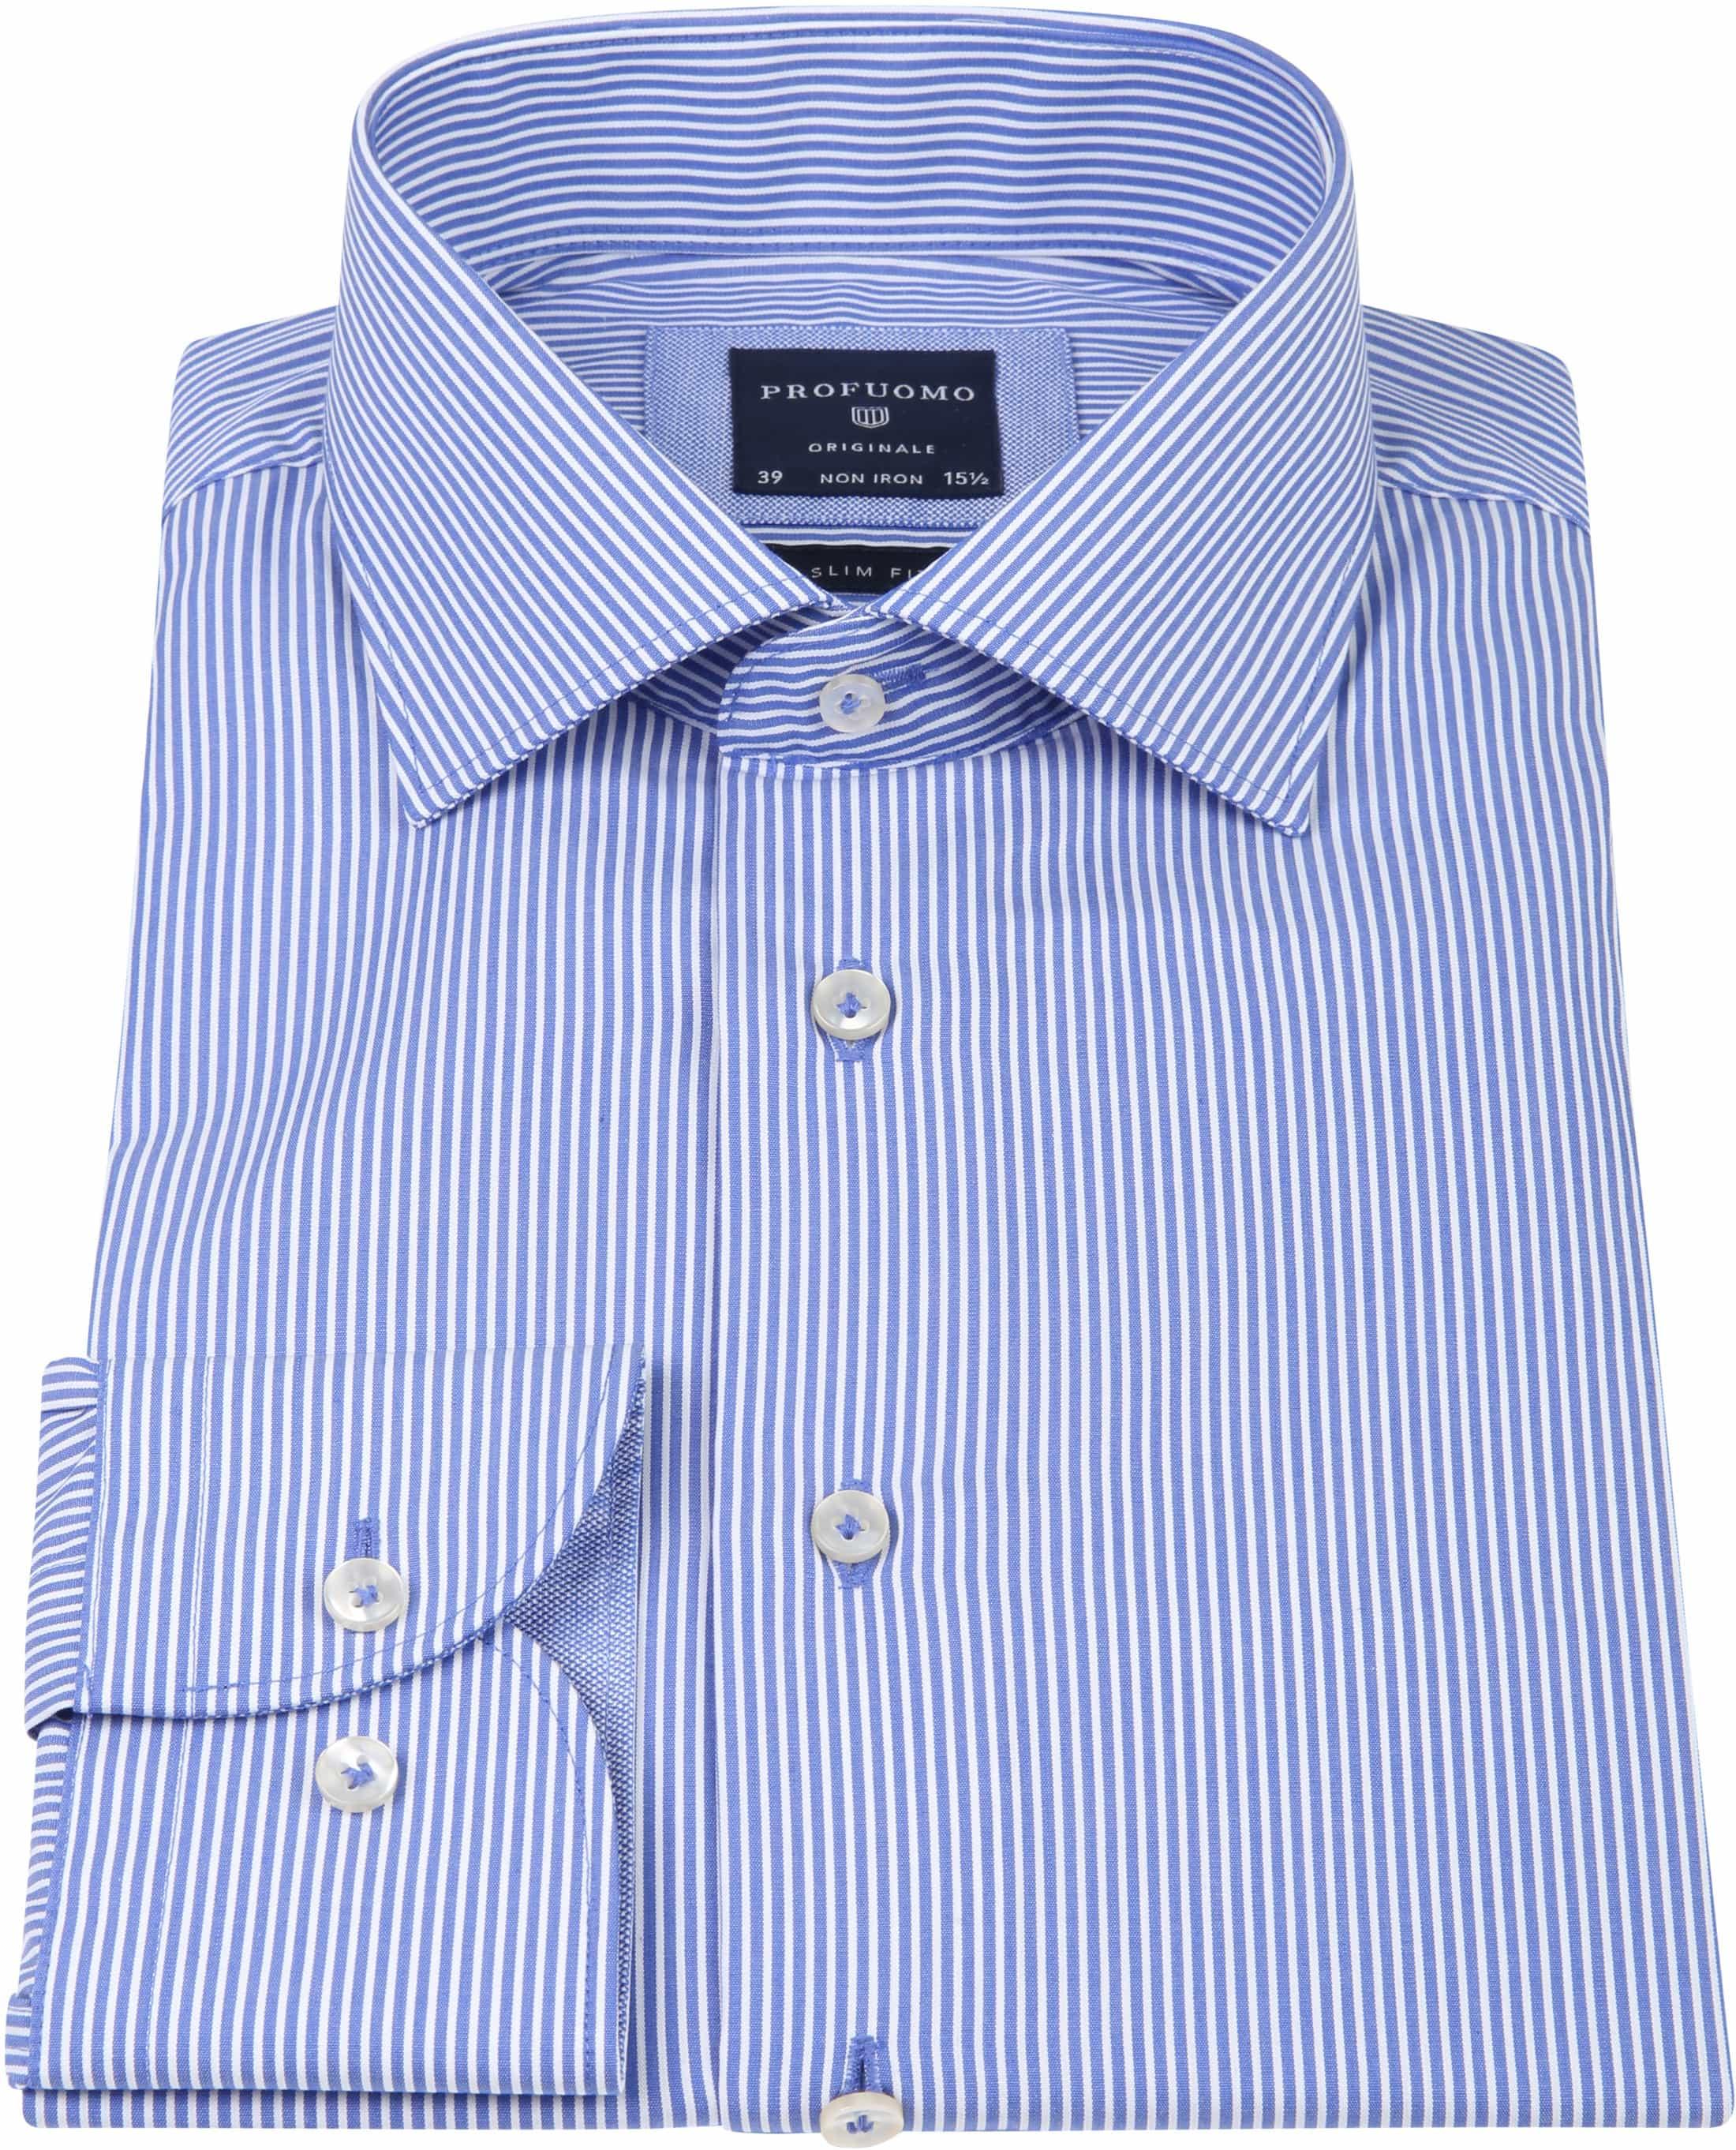 Profuomo Shirt CAW Striped Blue foto 3